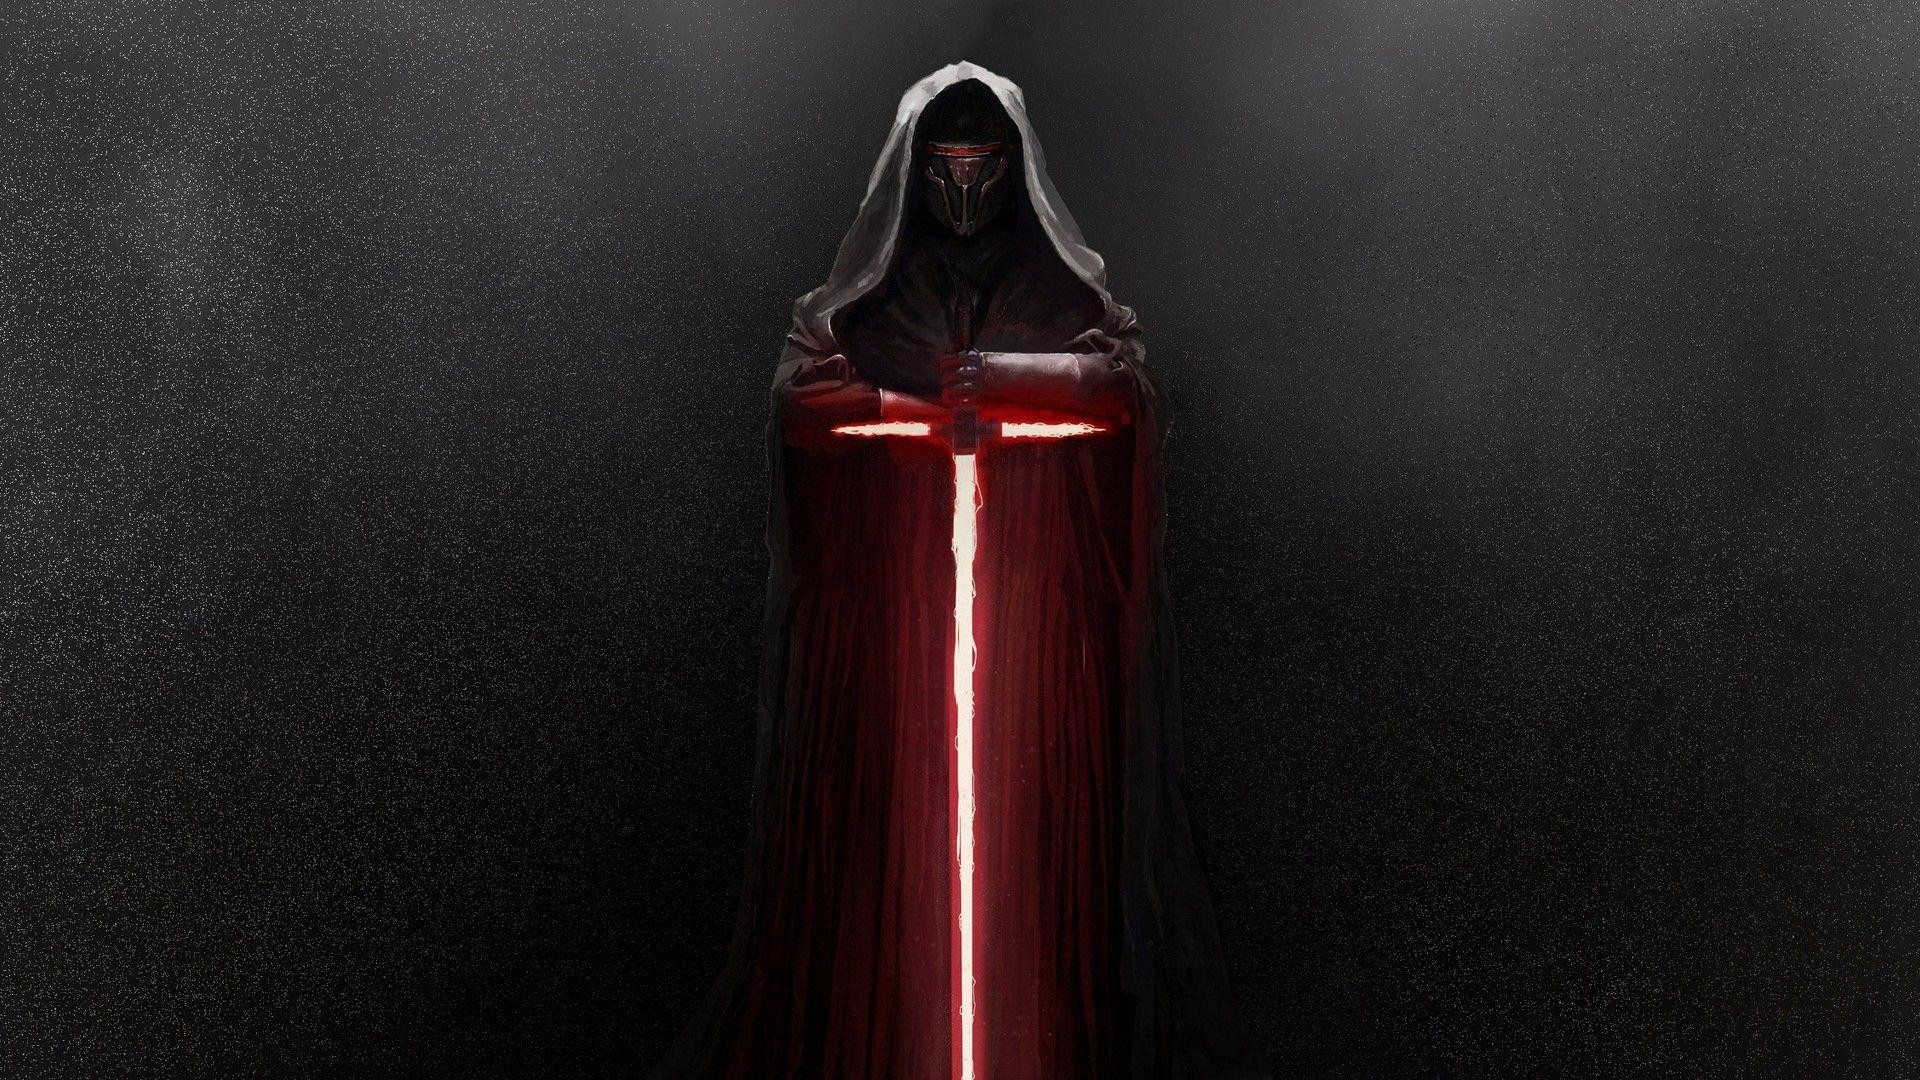 Sith desktop wallpaper download